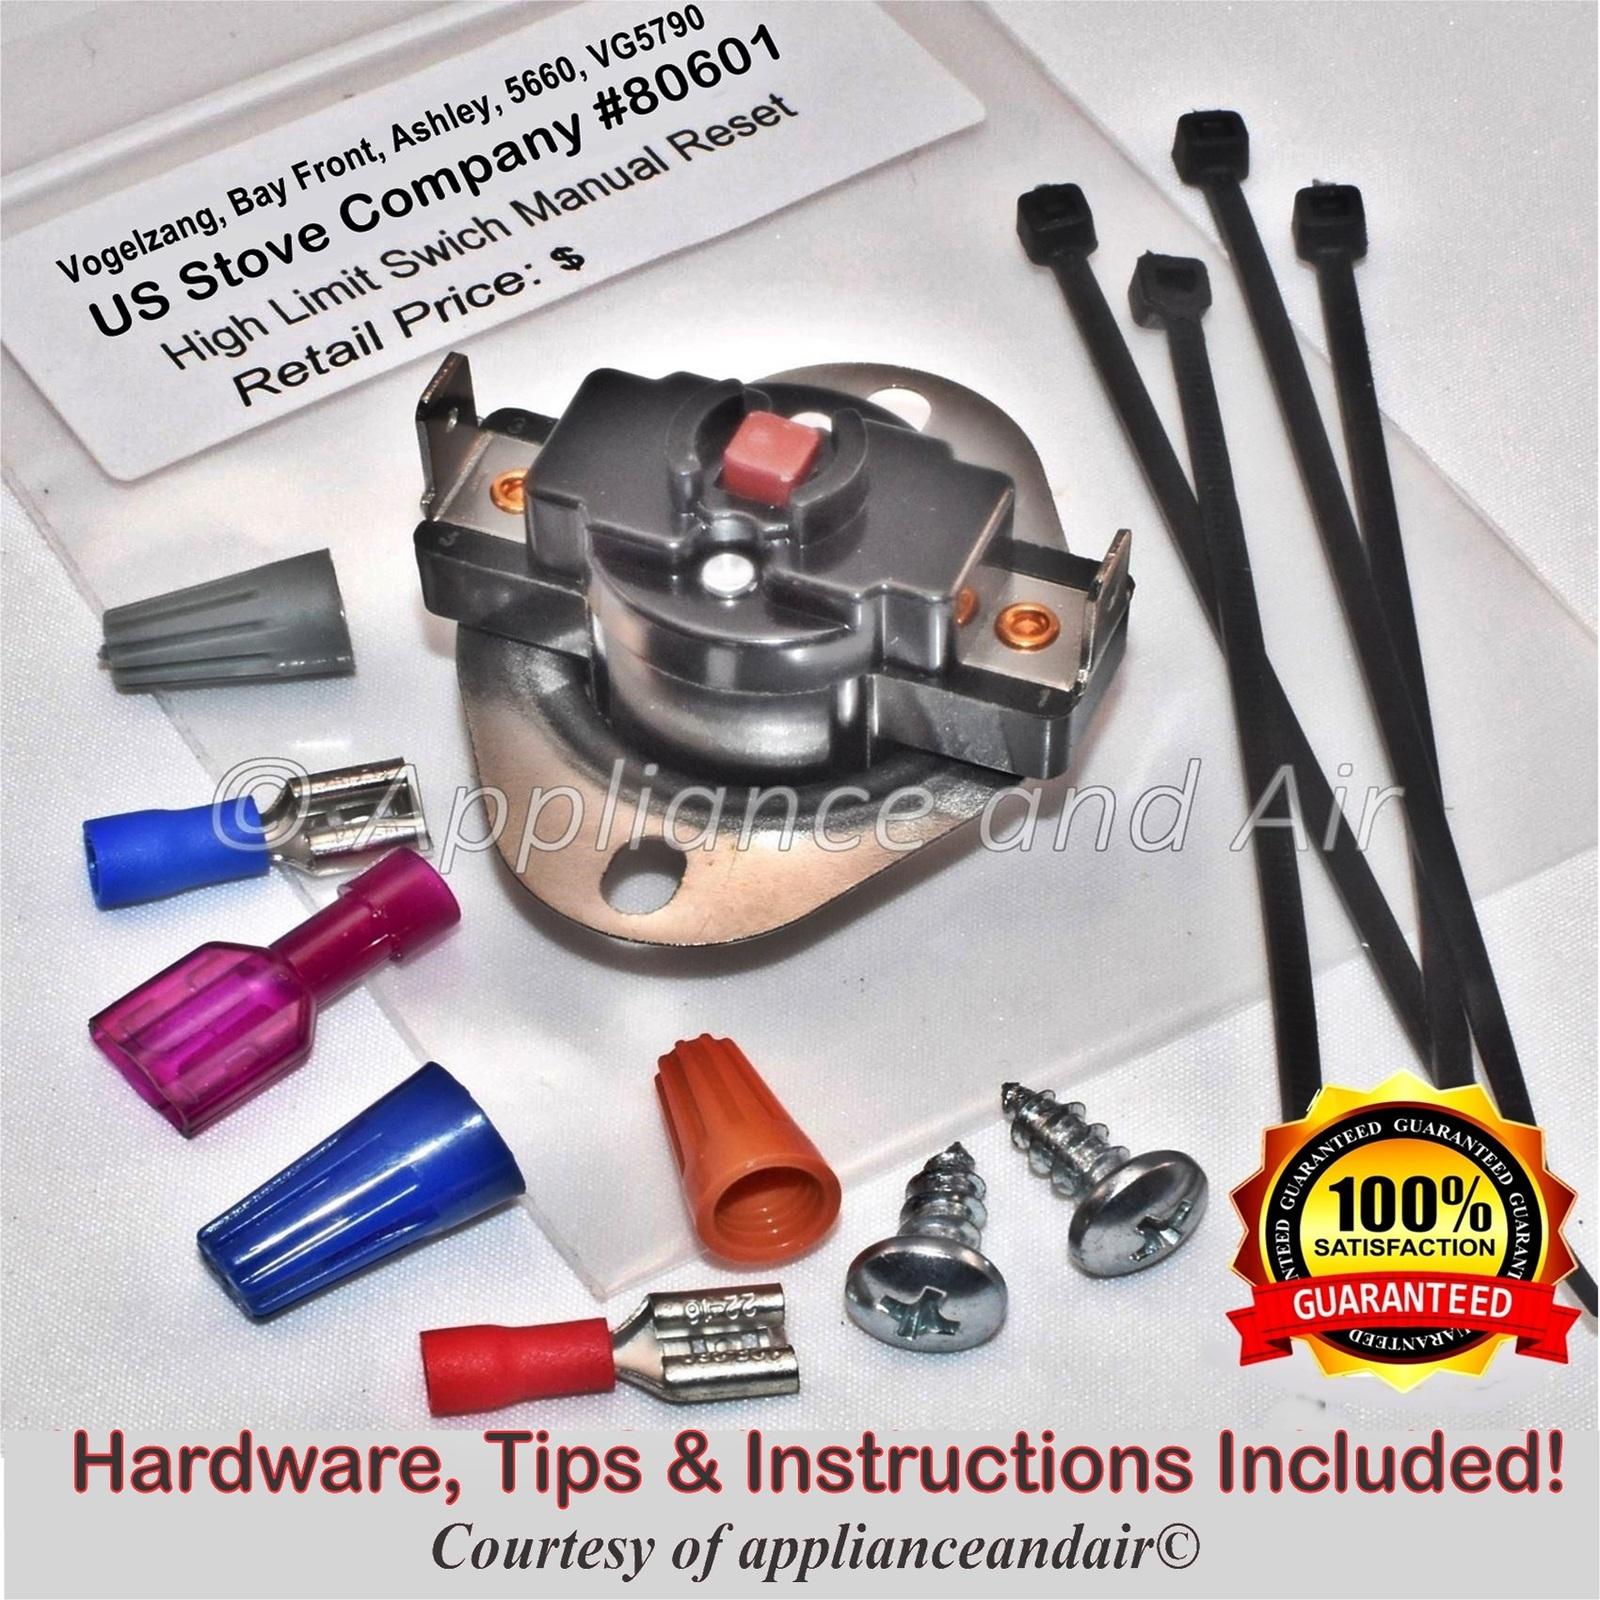 Us stove company 80601 manual reset limit